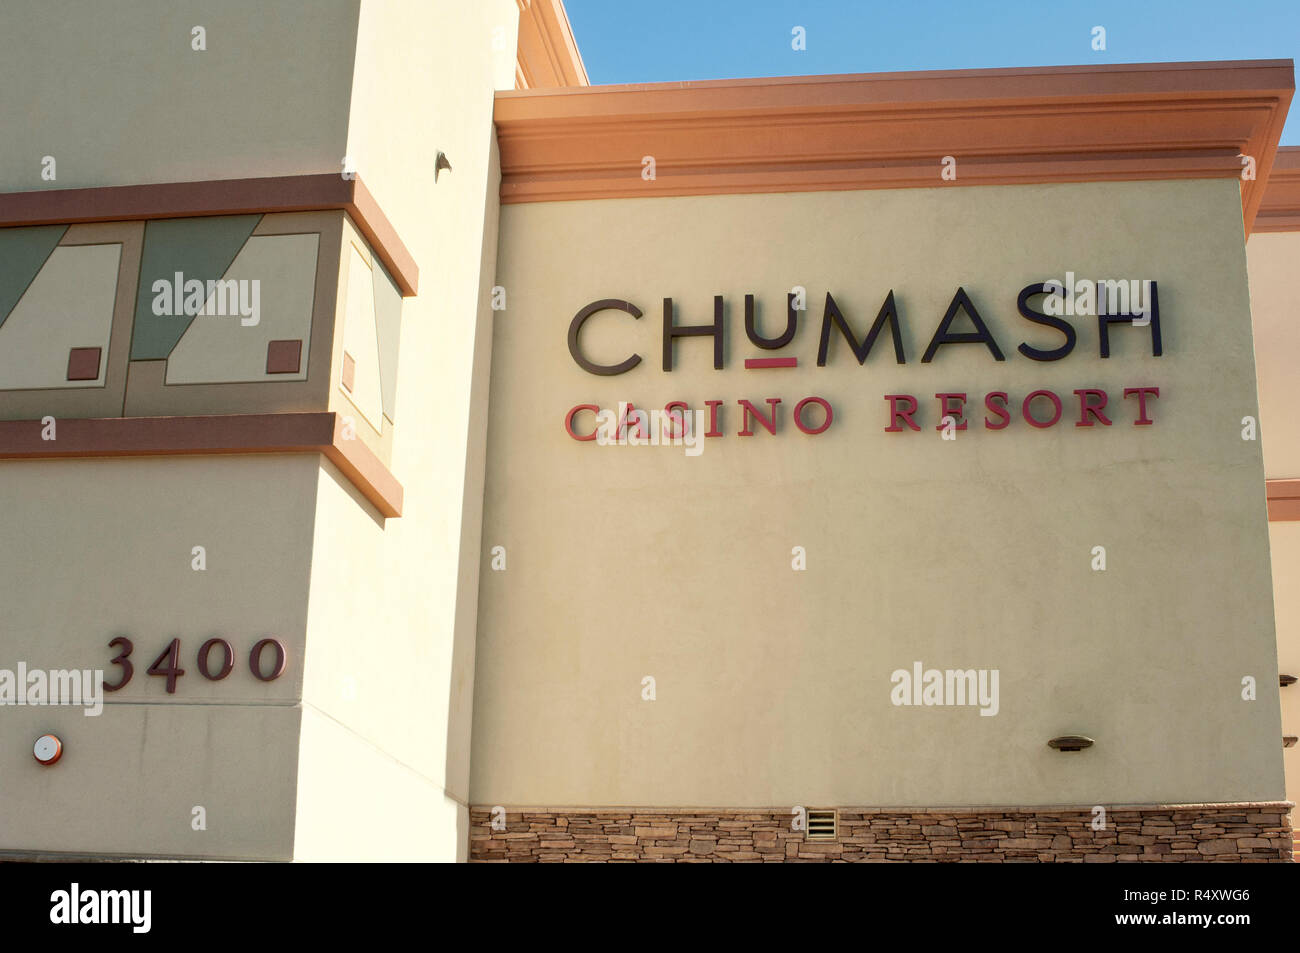 Chumash Casino Resort, Santa Ynez Reservation, California. Digital photograph - Stock Image